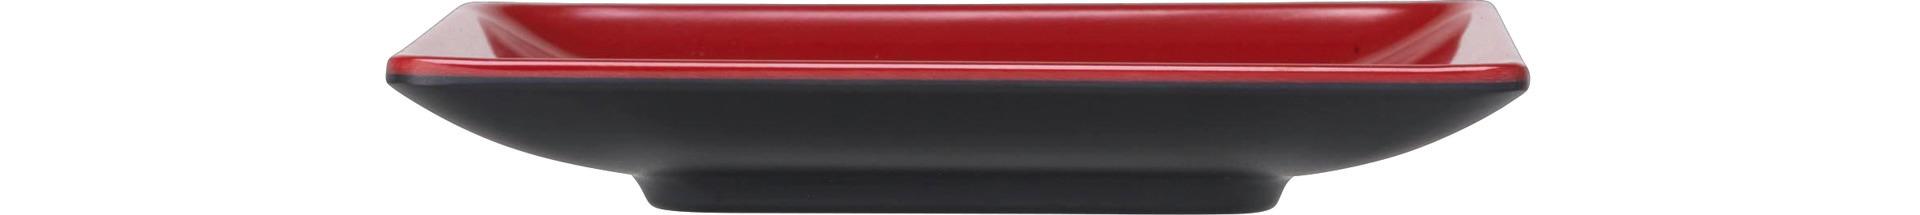 Platte quadratisch 127 x 127 x 19 mm rot-schwarz